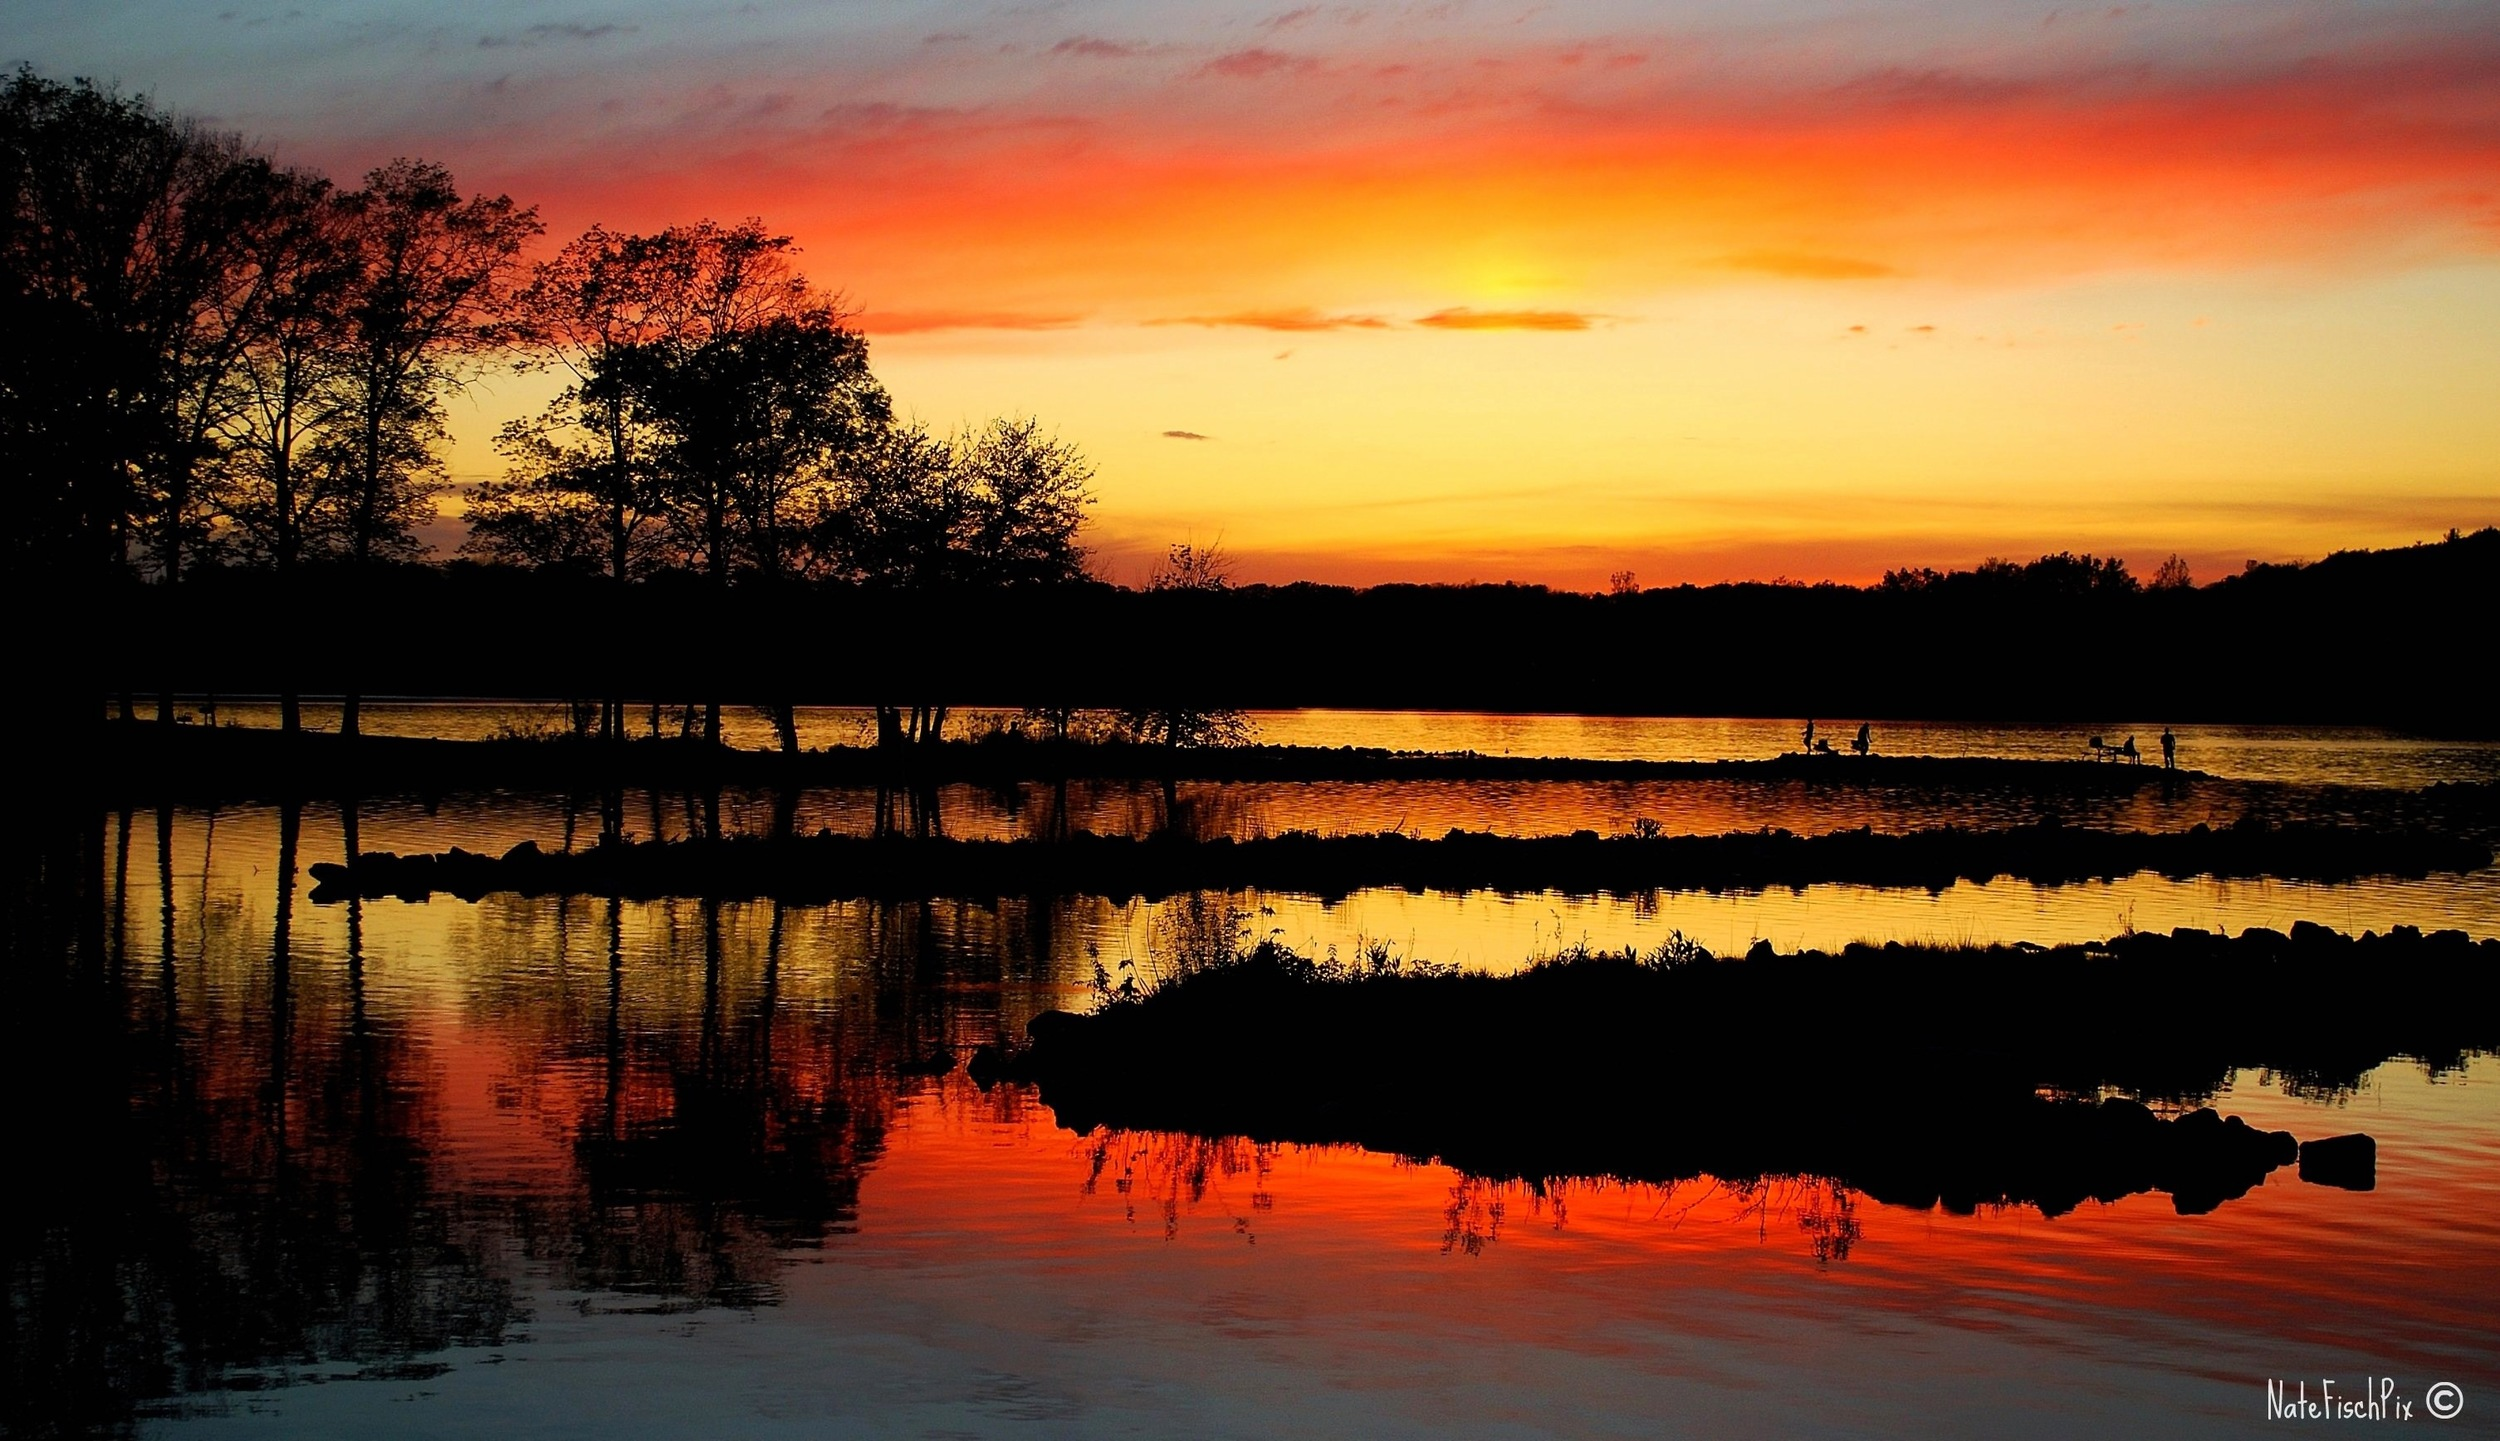 Sunset on Lake MacBride Nathan Fischer 2010 Photograph Custom $100